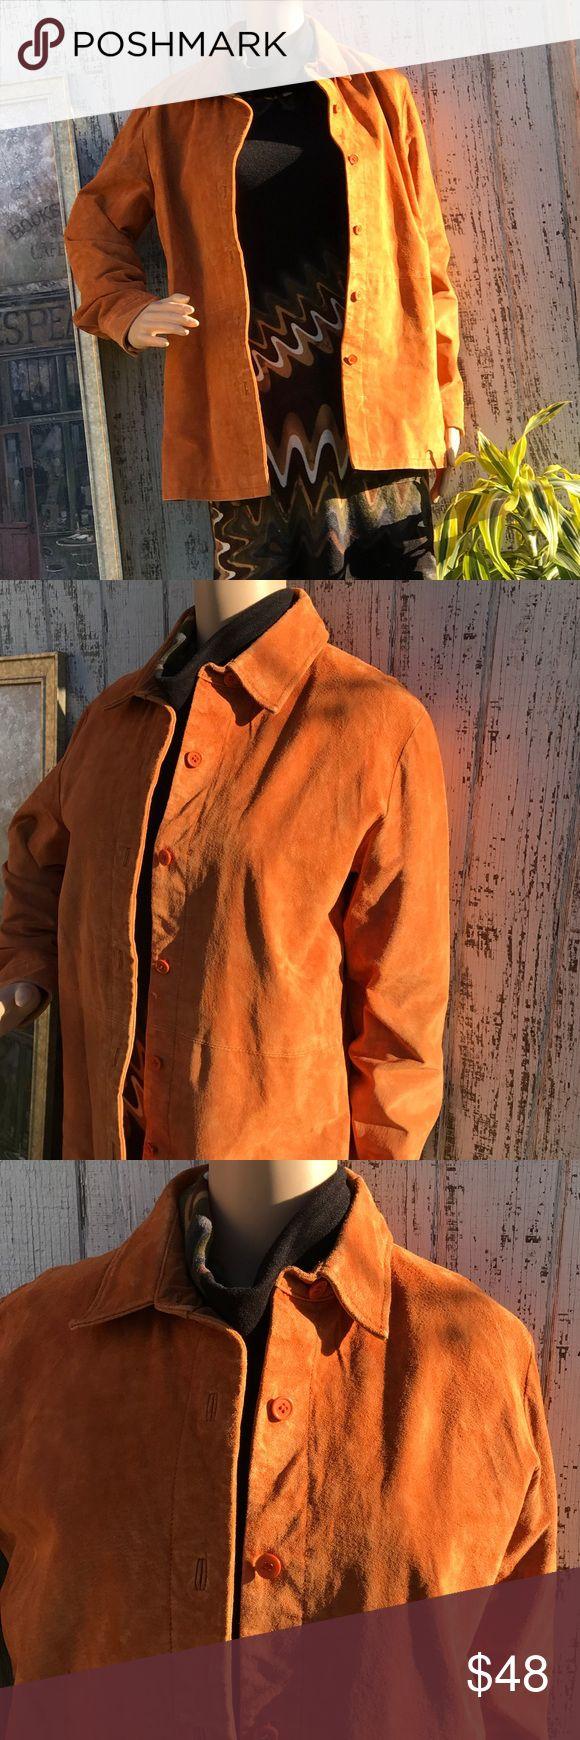 jessica holbrook leather jacket